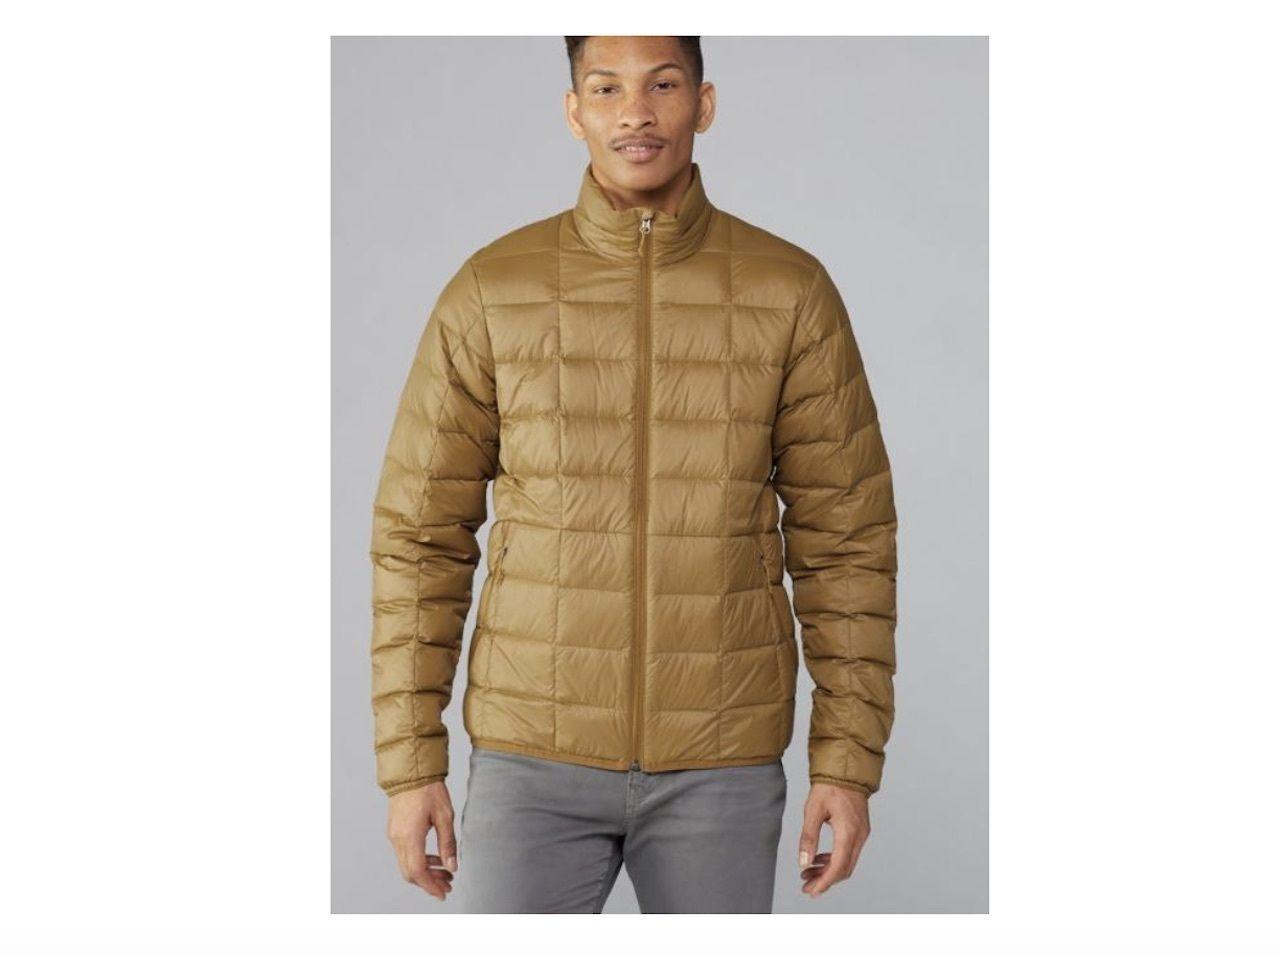 puffer-jacket-gear-for-trekking-in-latin-america, gear for trekking in Latin America